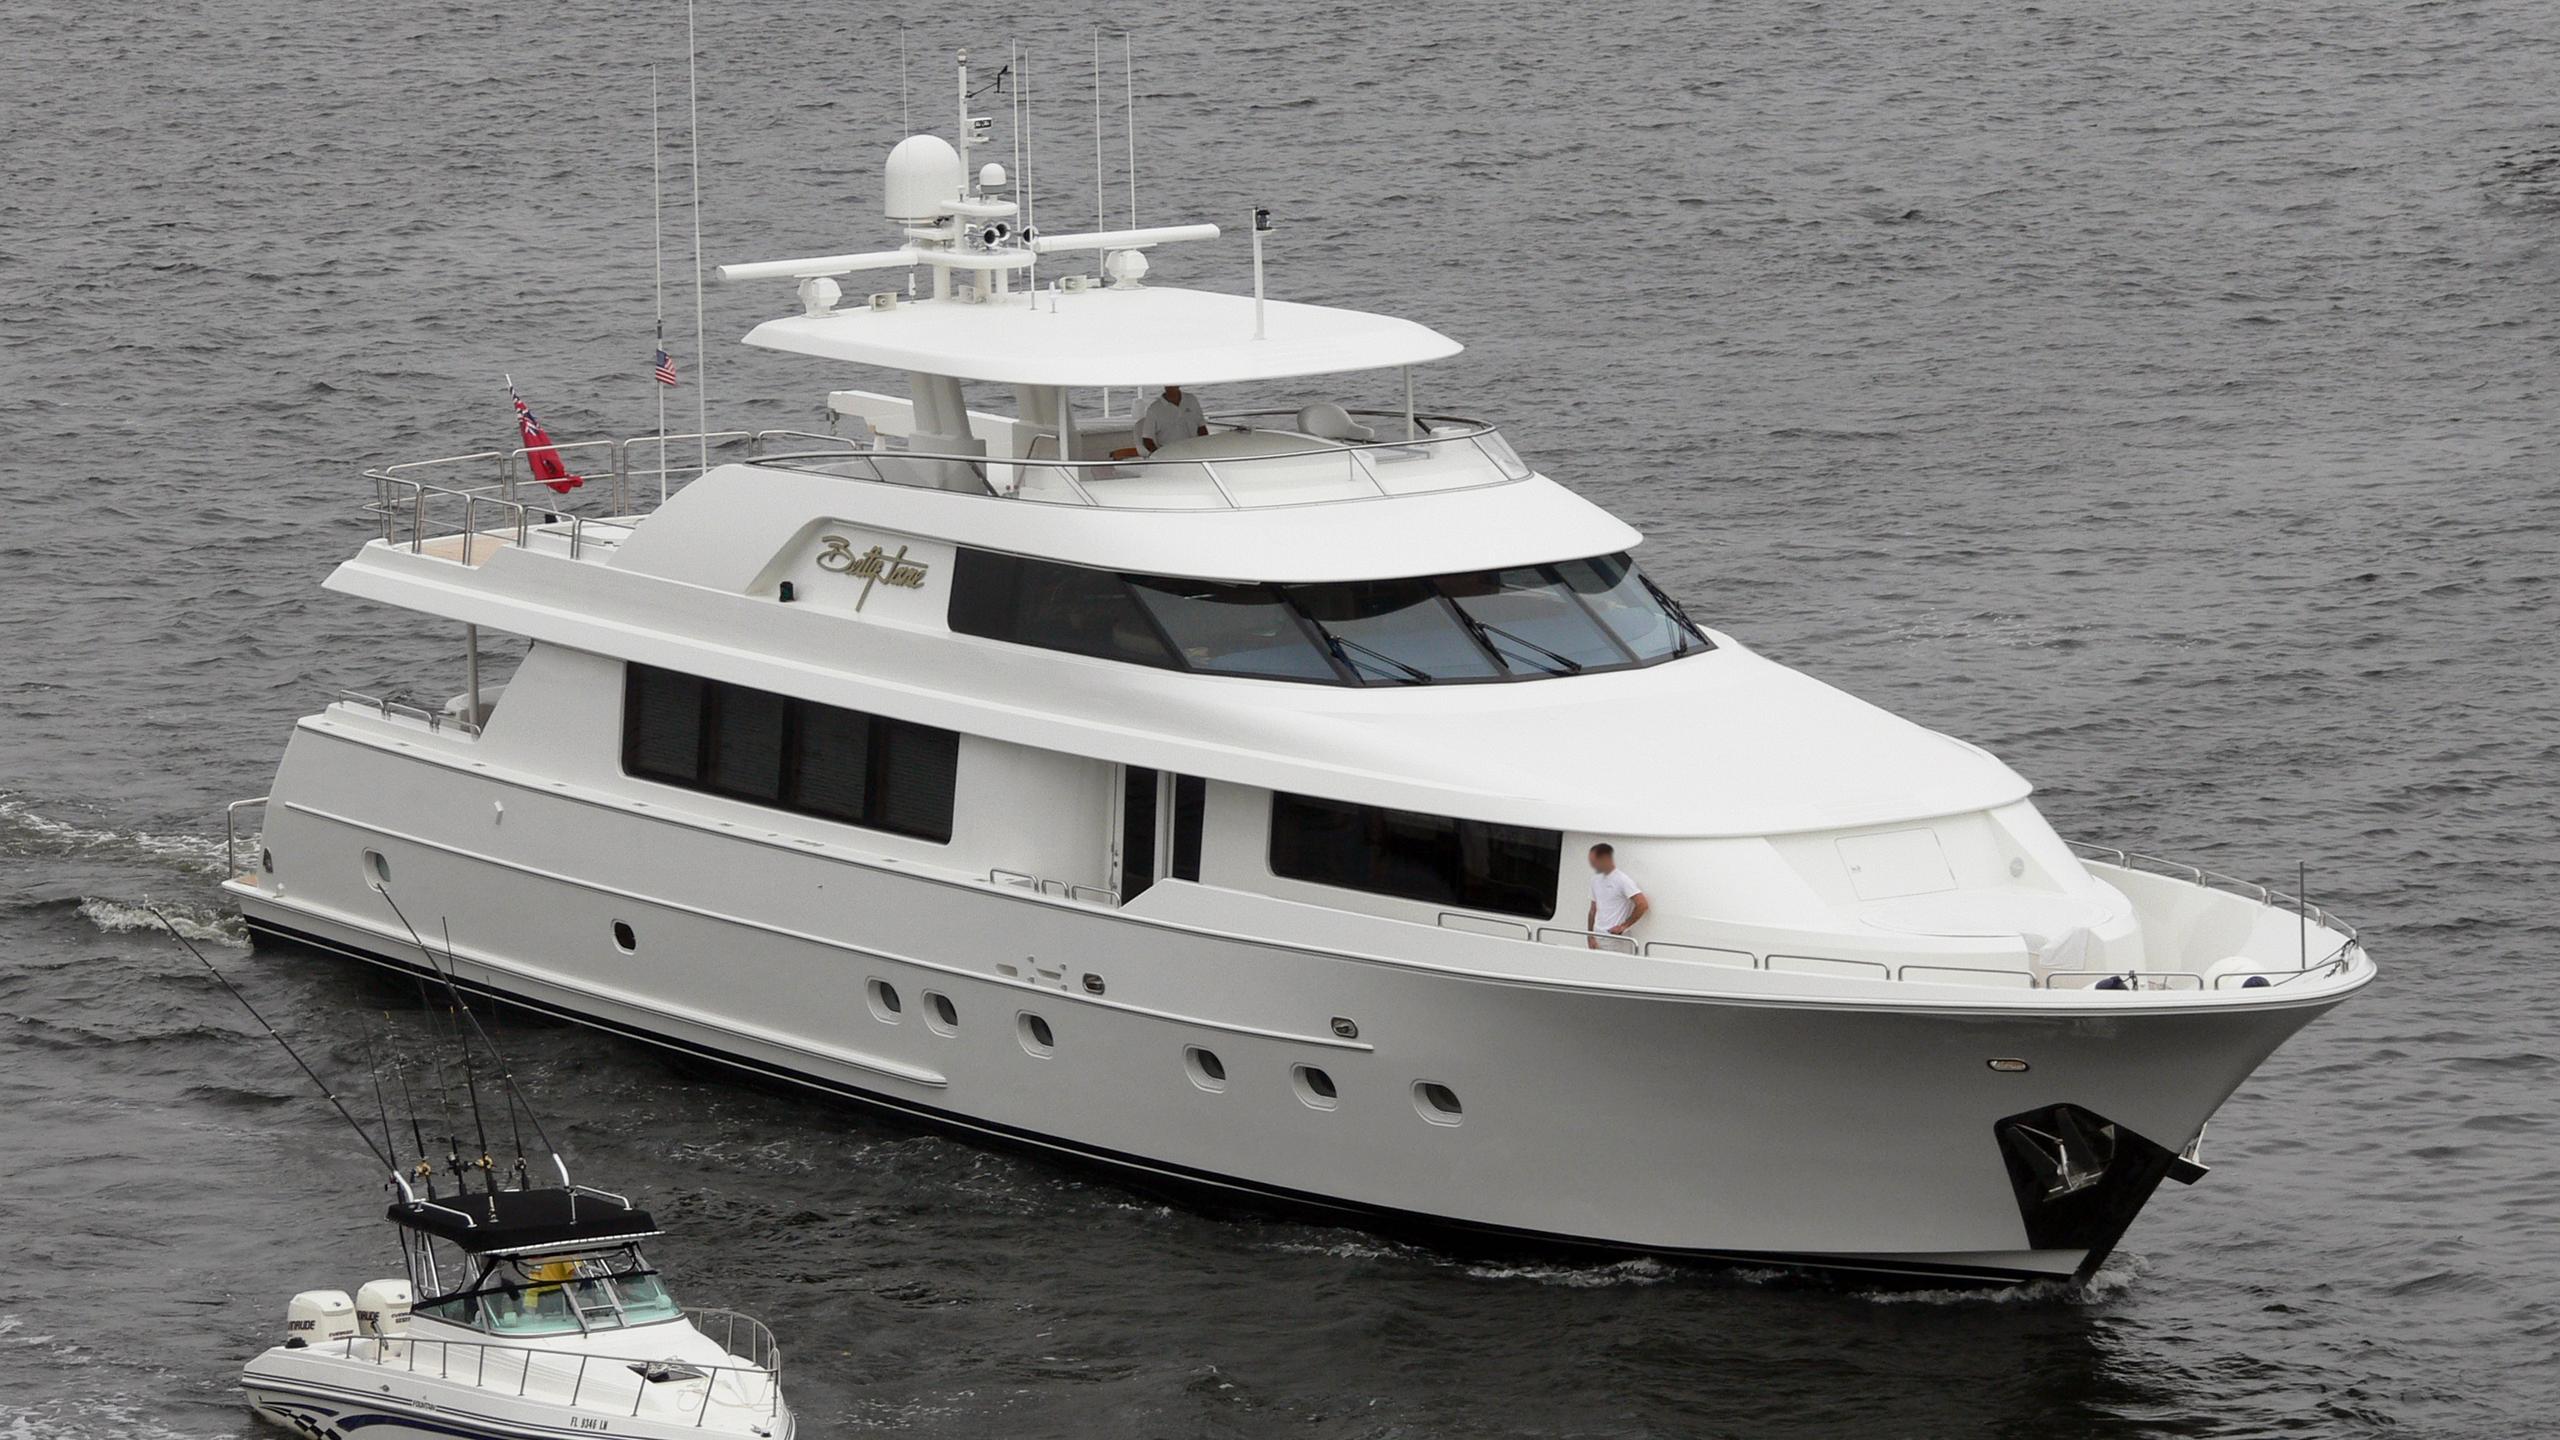 sharon-lee-motor-yacht-westport-112-2003-34m-cruising